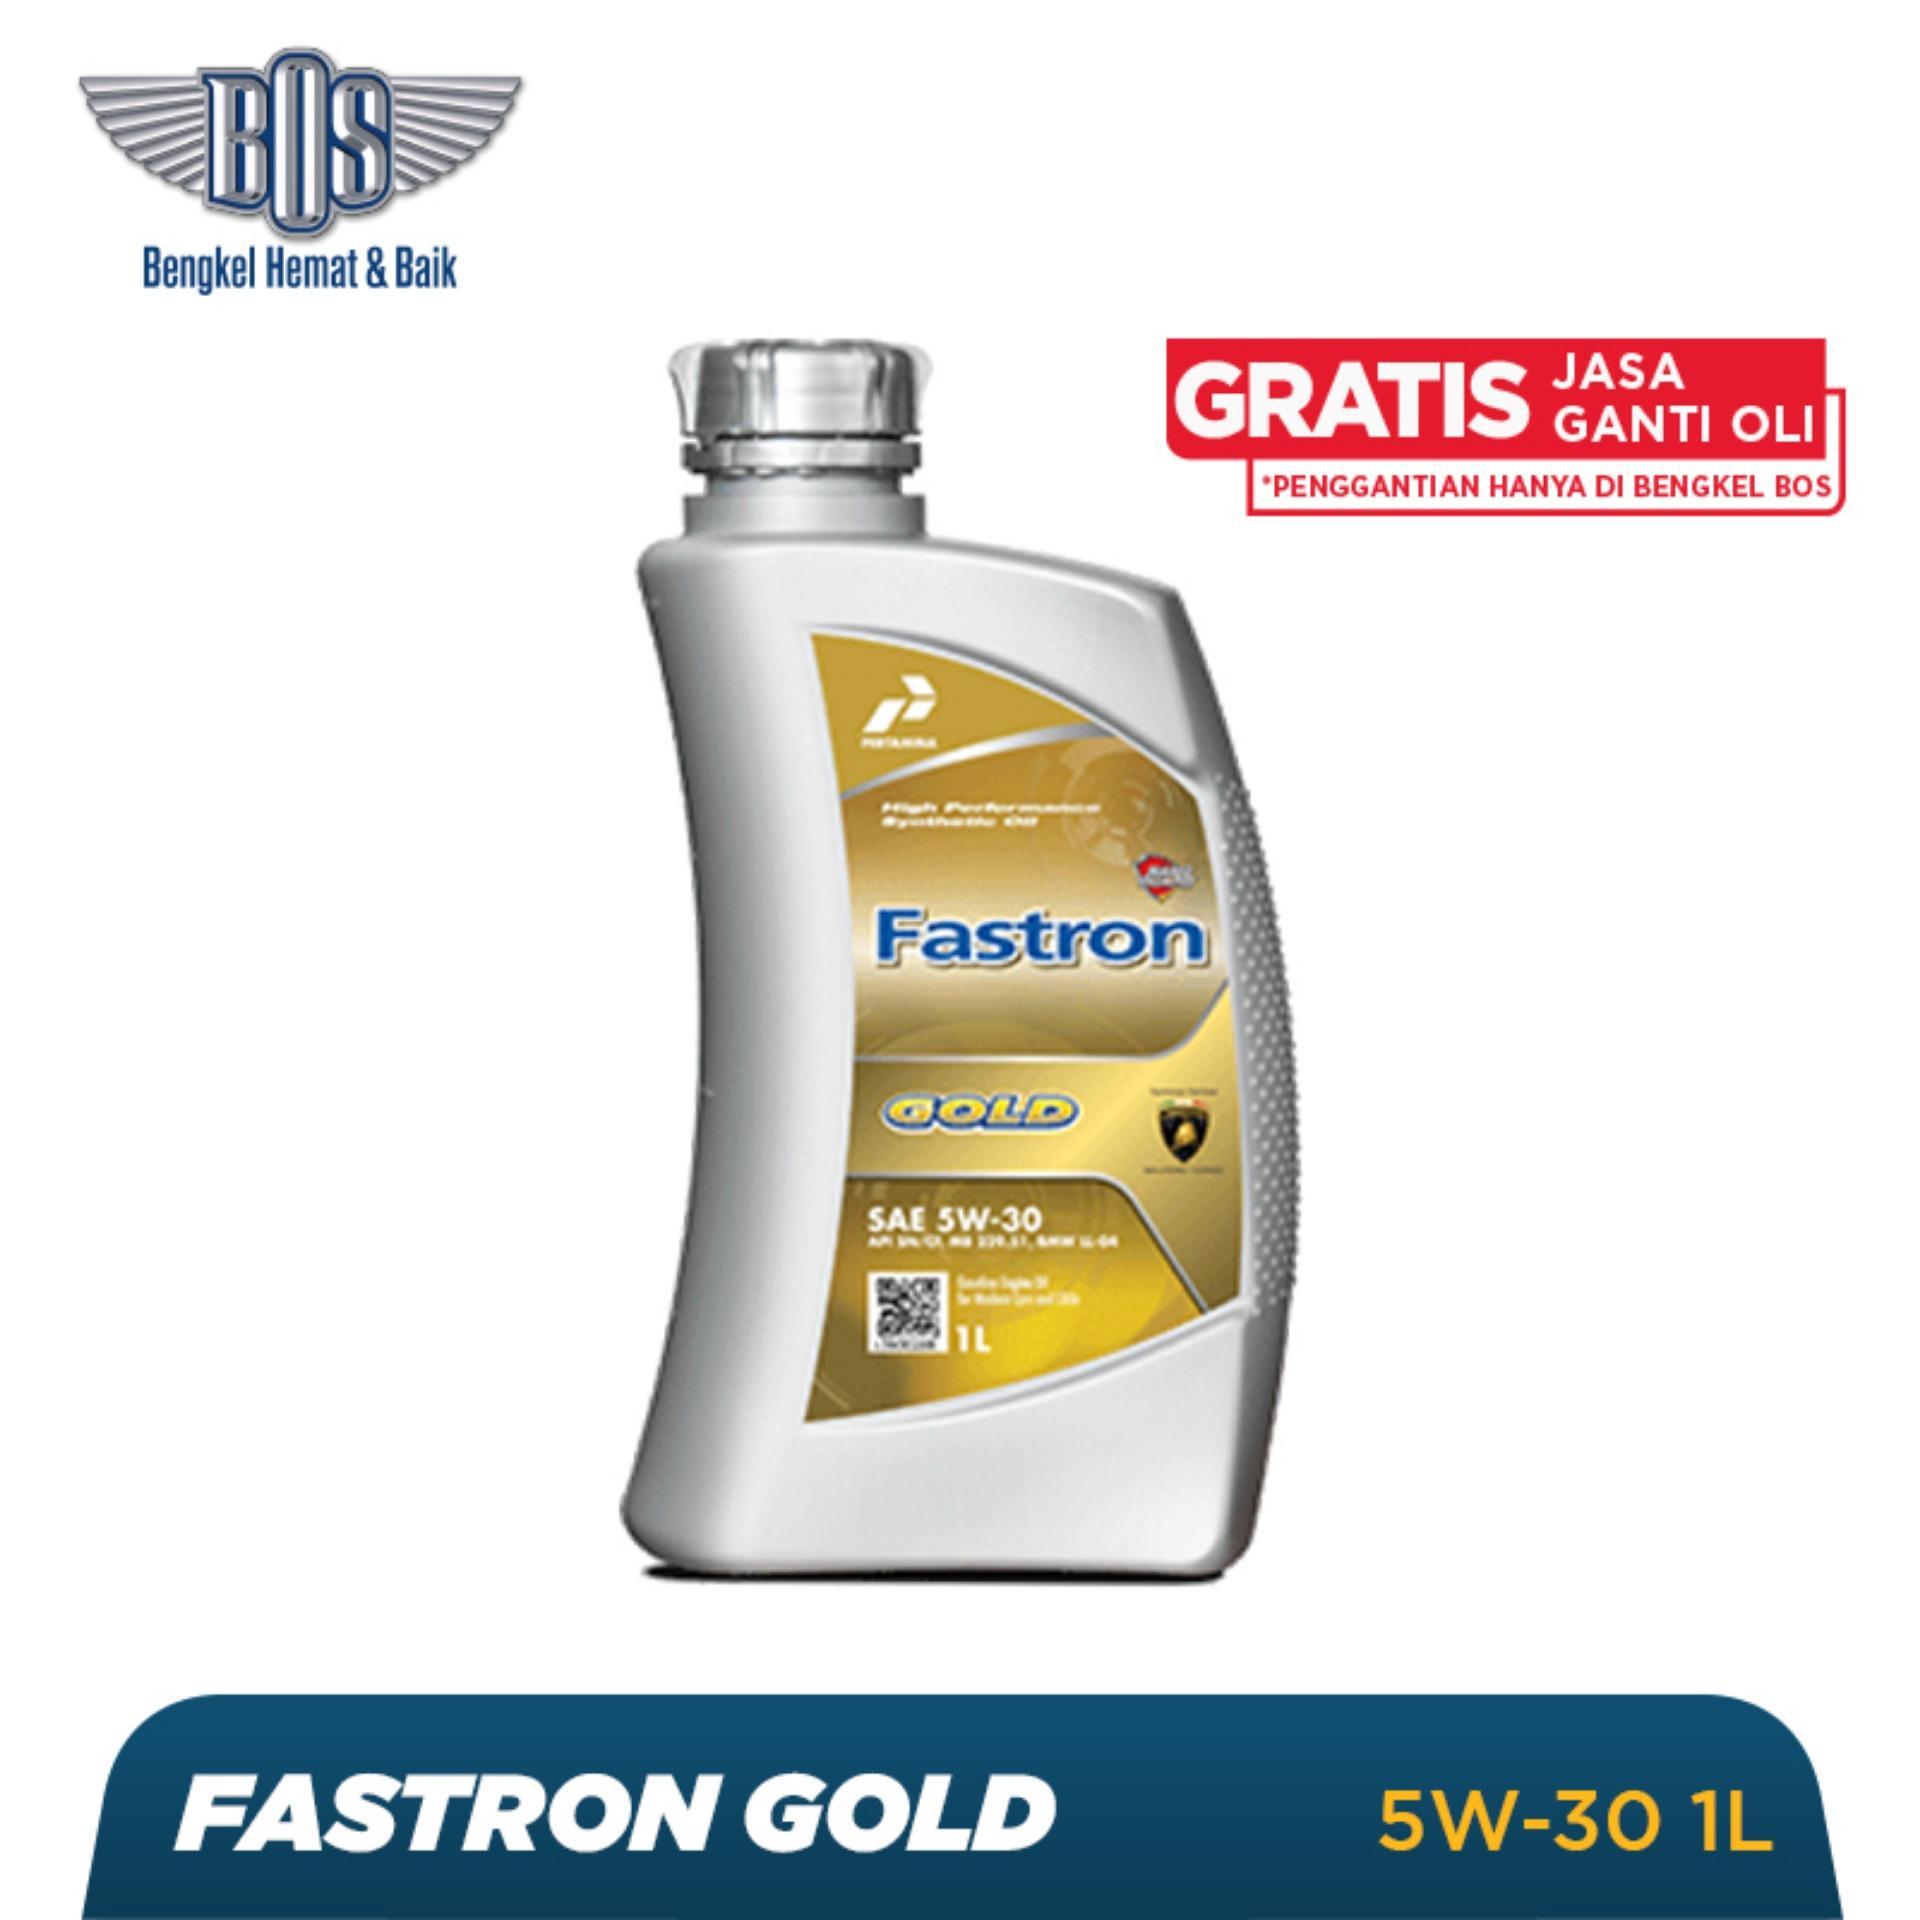 Oli Mobil Fastron Gold  - 5W-30 - LITER -  Gratis Jasa Ganti Oli dan Check Up Kendaraan